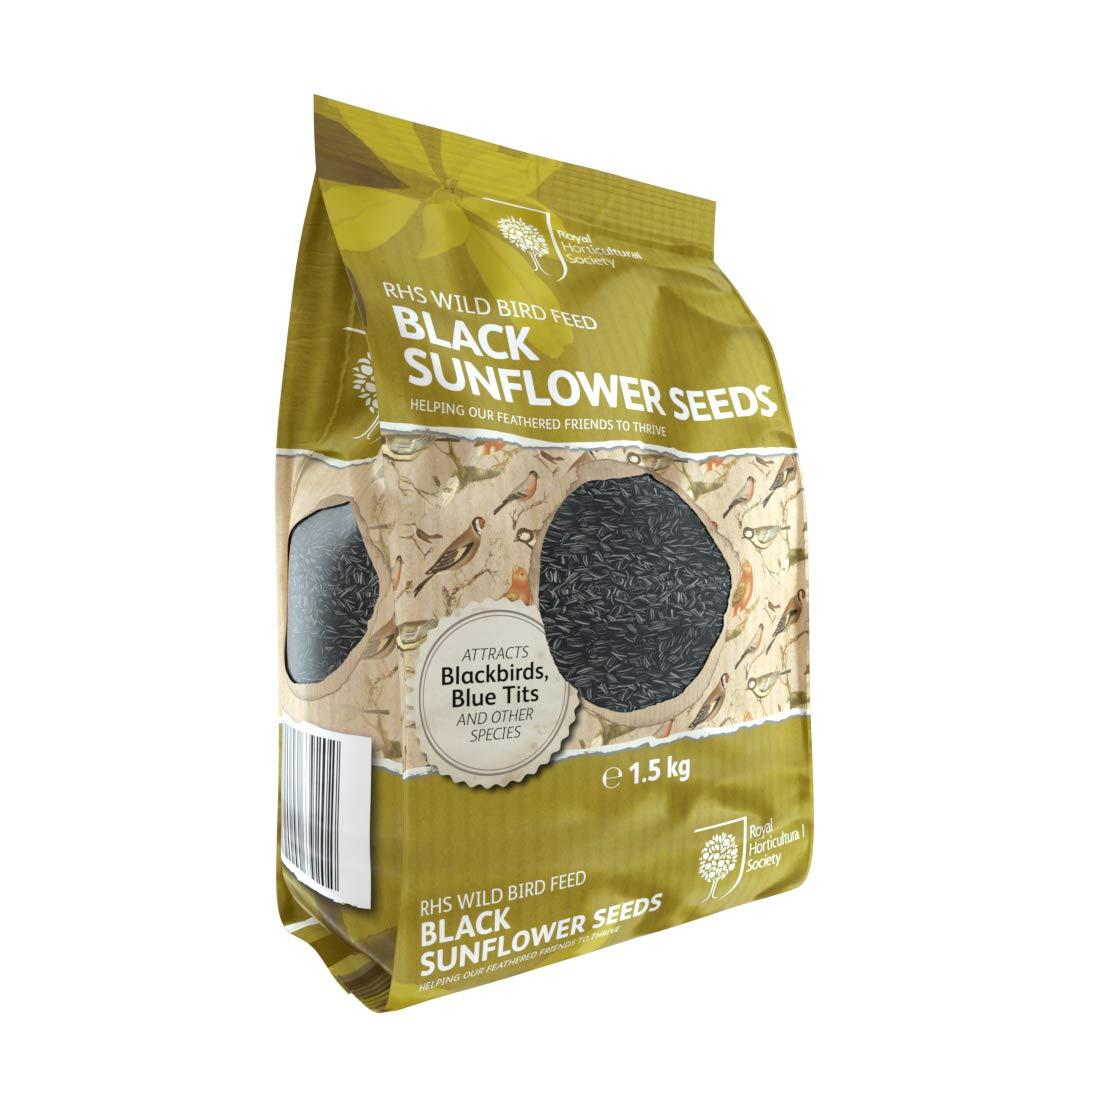 RHS Wild Bird Feed Black Sunflower Seeds-1.5KG, AGROS Trading